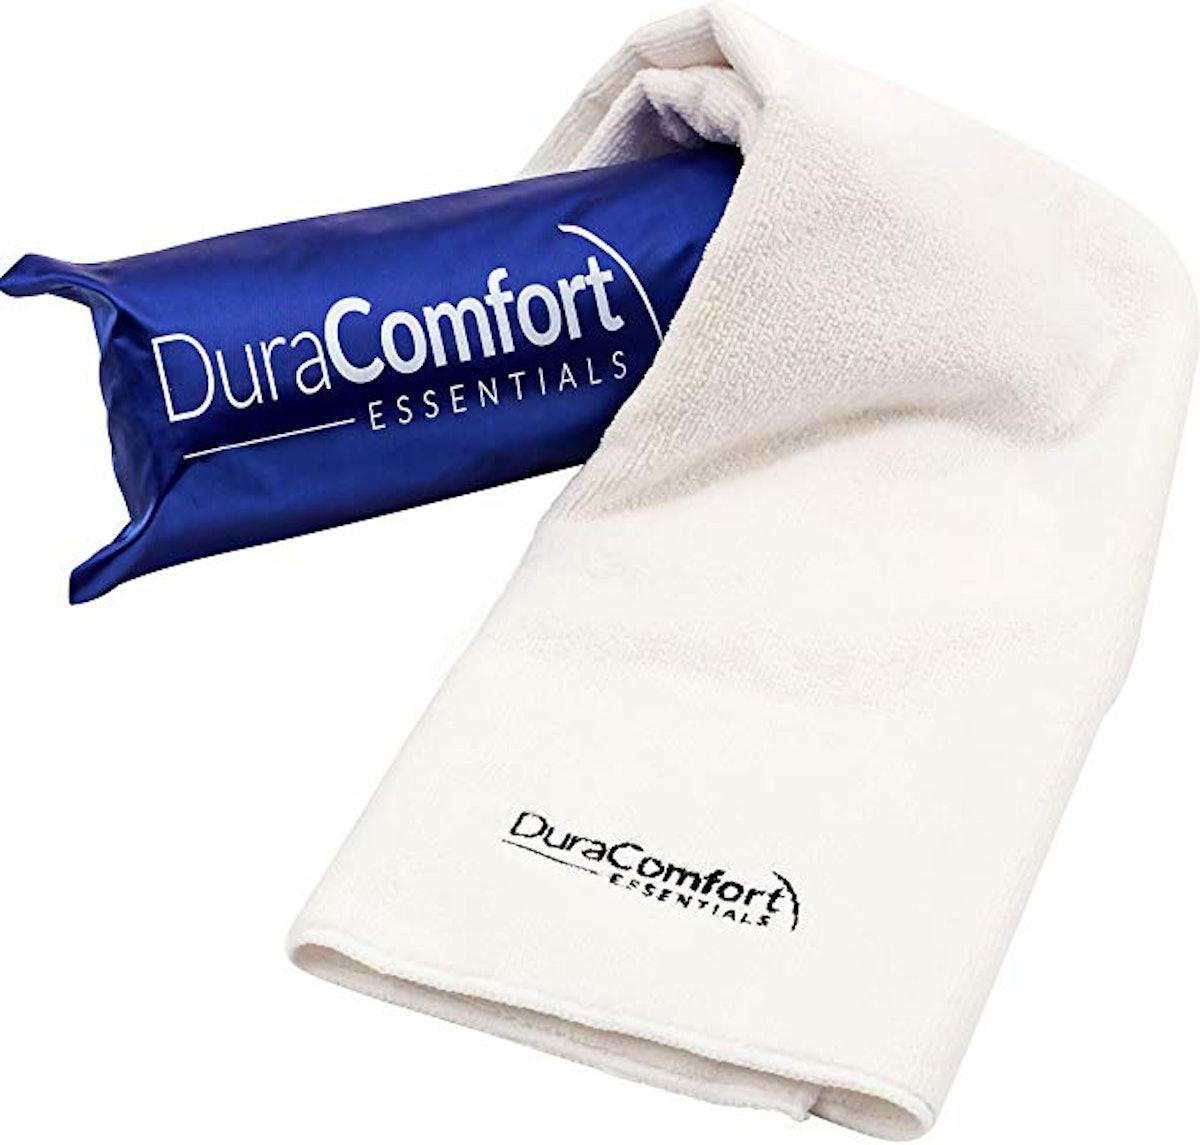 DuraComfort Essentials Anti-Frizz Microfiber Hair Towel,